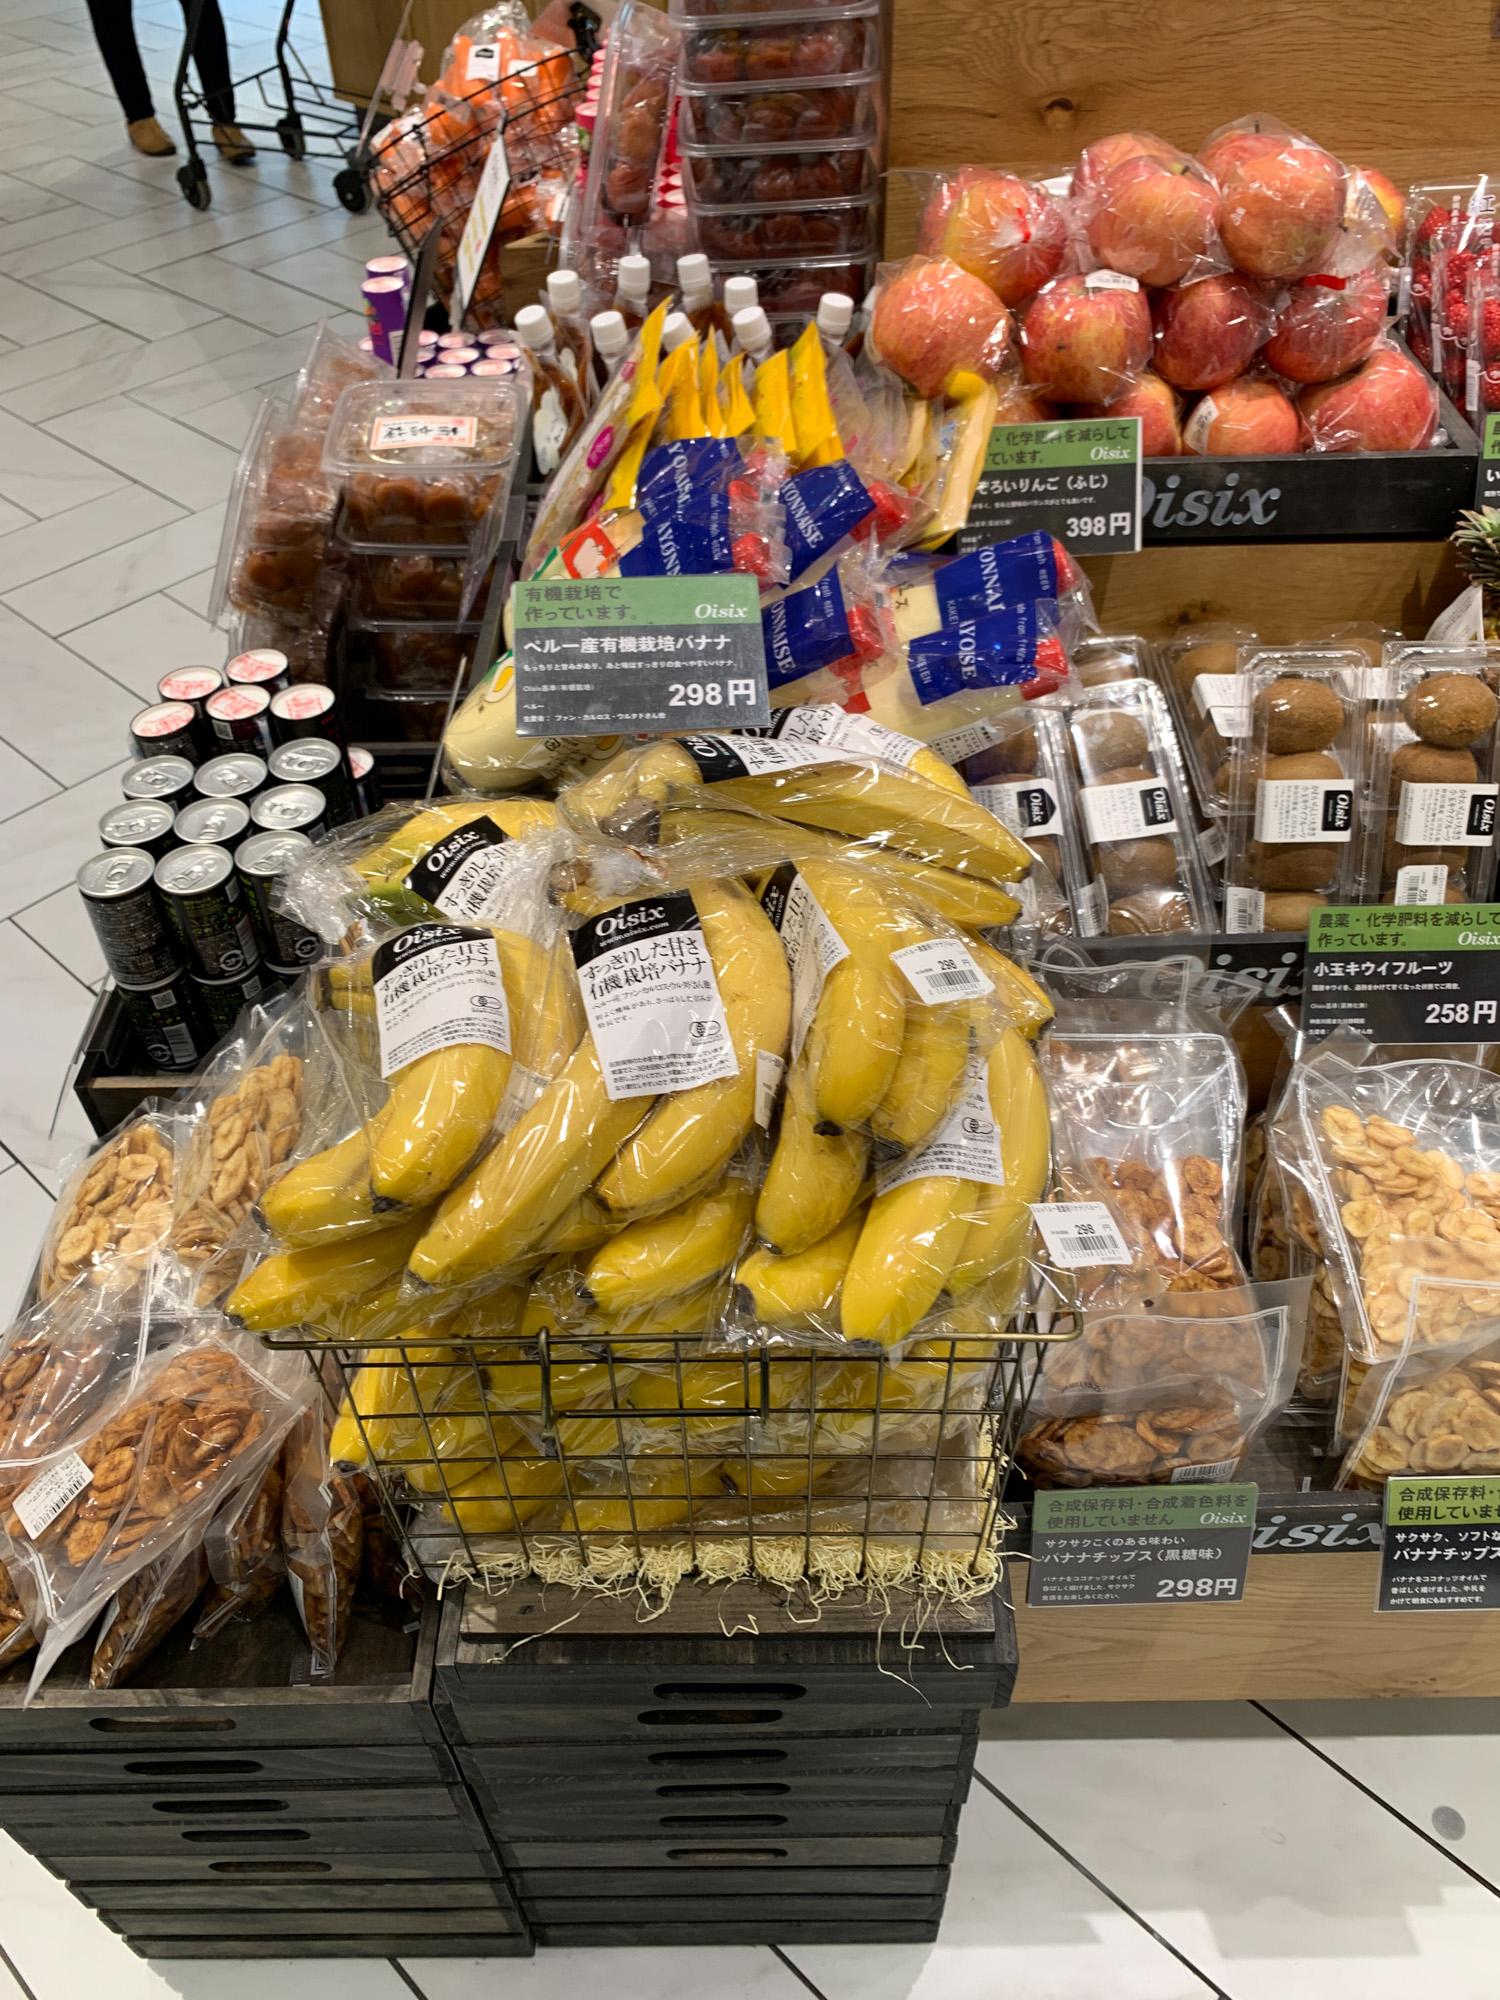 Organic bananas in Tokyo